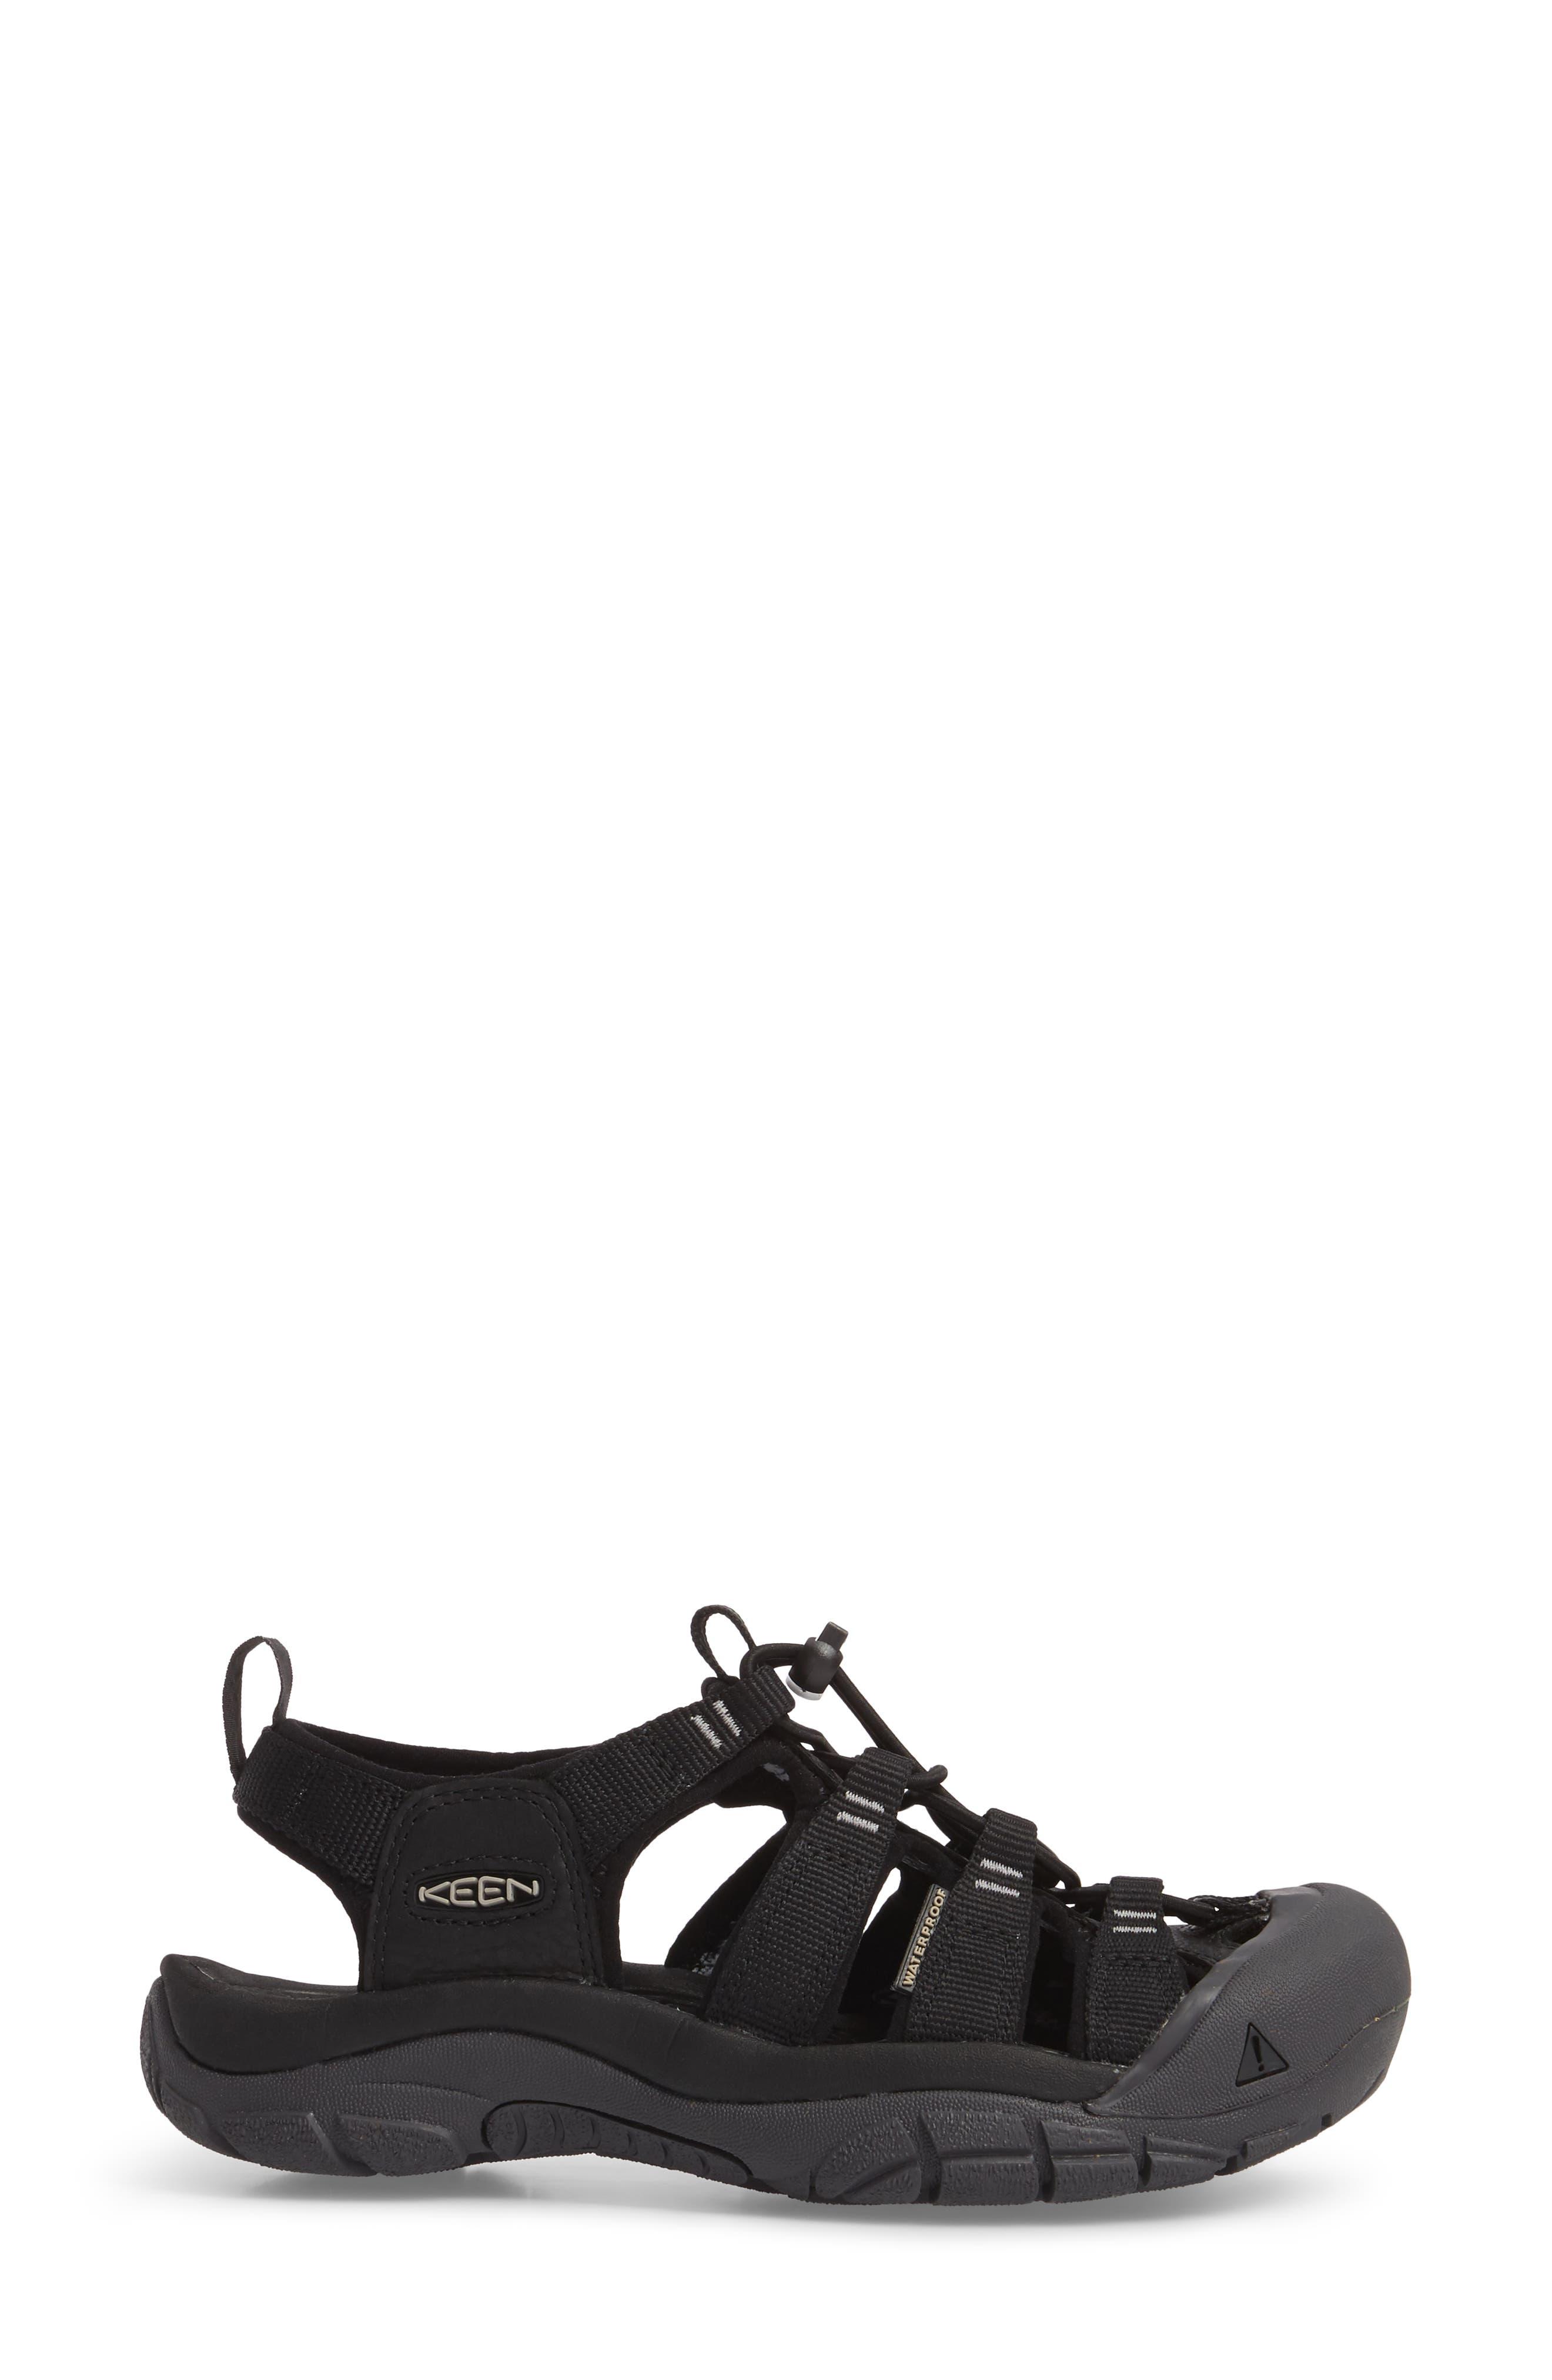 Newport Eco Waterproof Sandal,                             Alternate thumbnail 3, color,                             Black/ Magnet